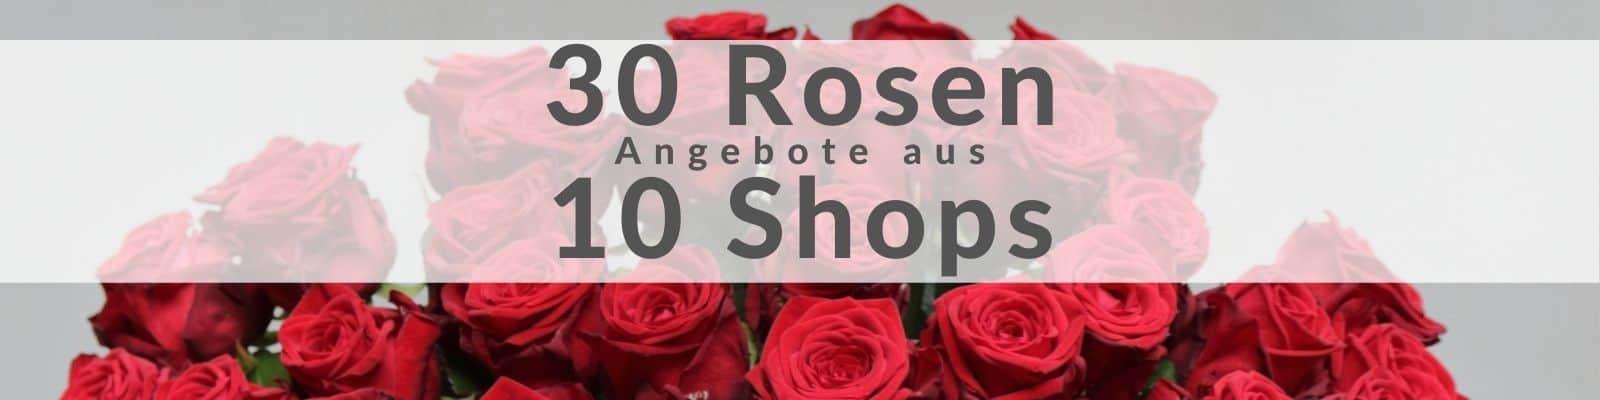 30 Rosen bestellen